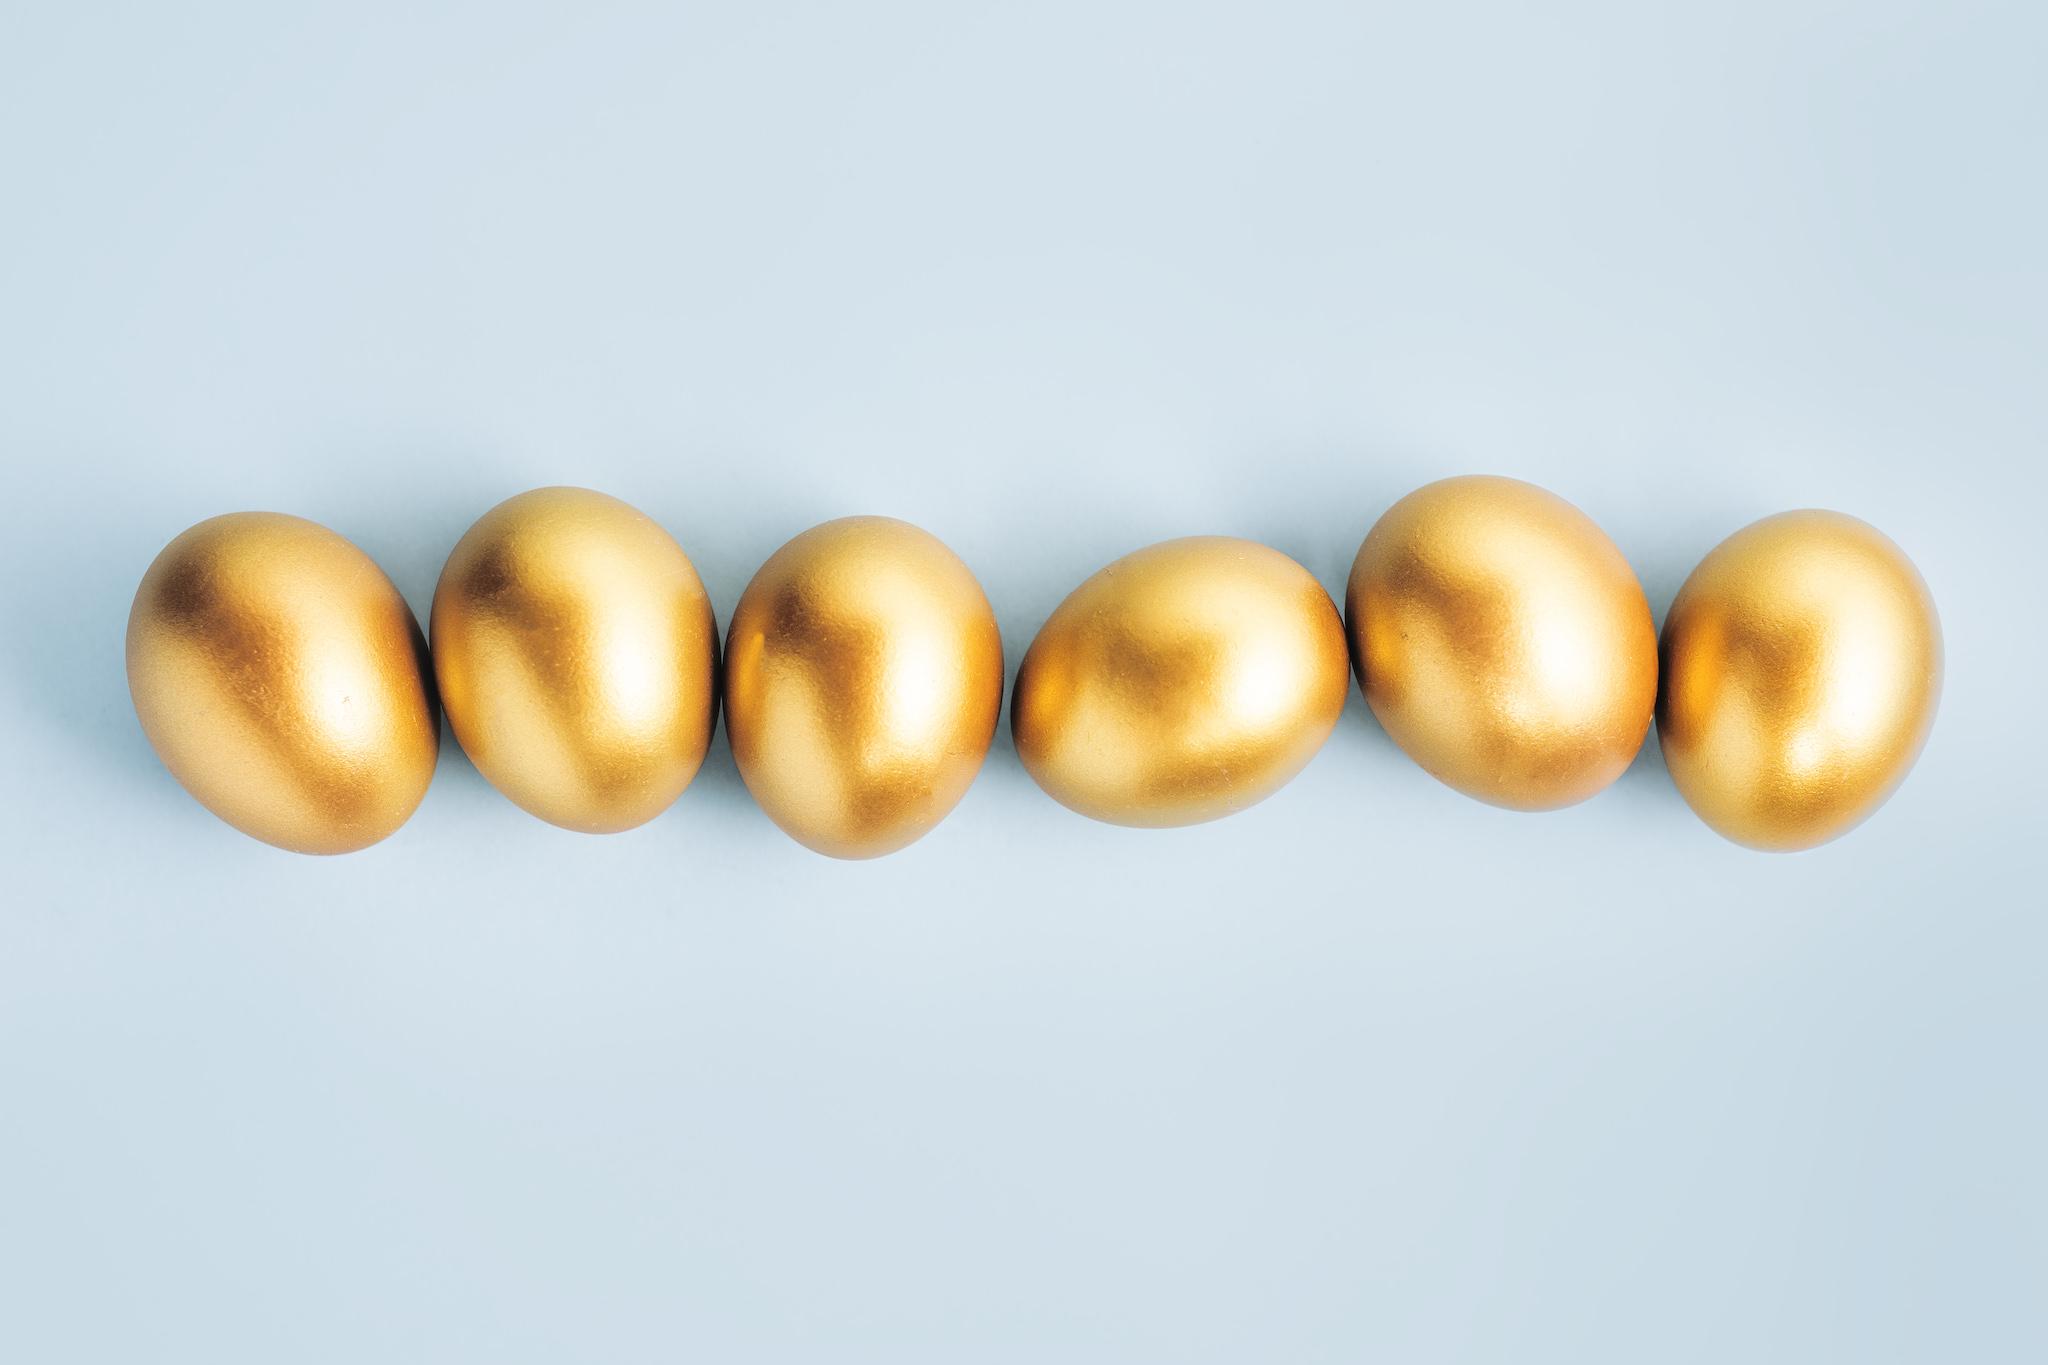 Золотые яйца — Food photo created by valeria_aksakova